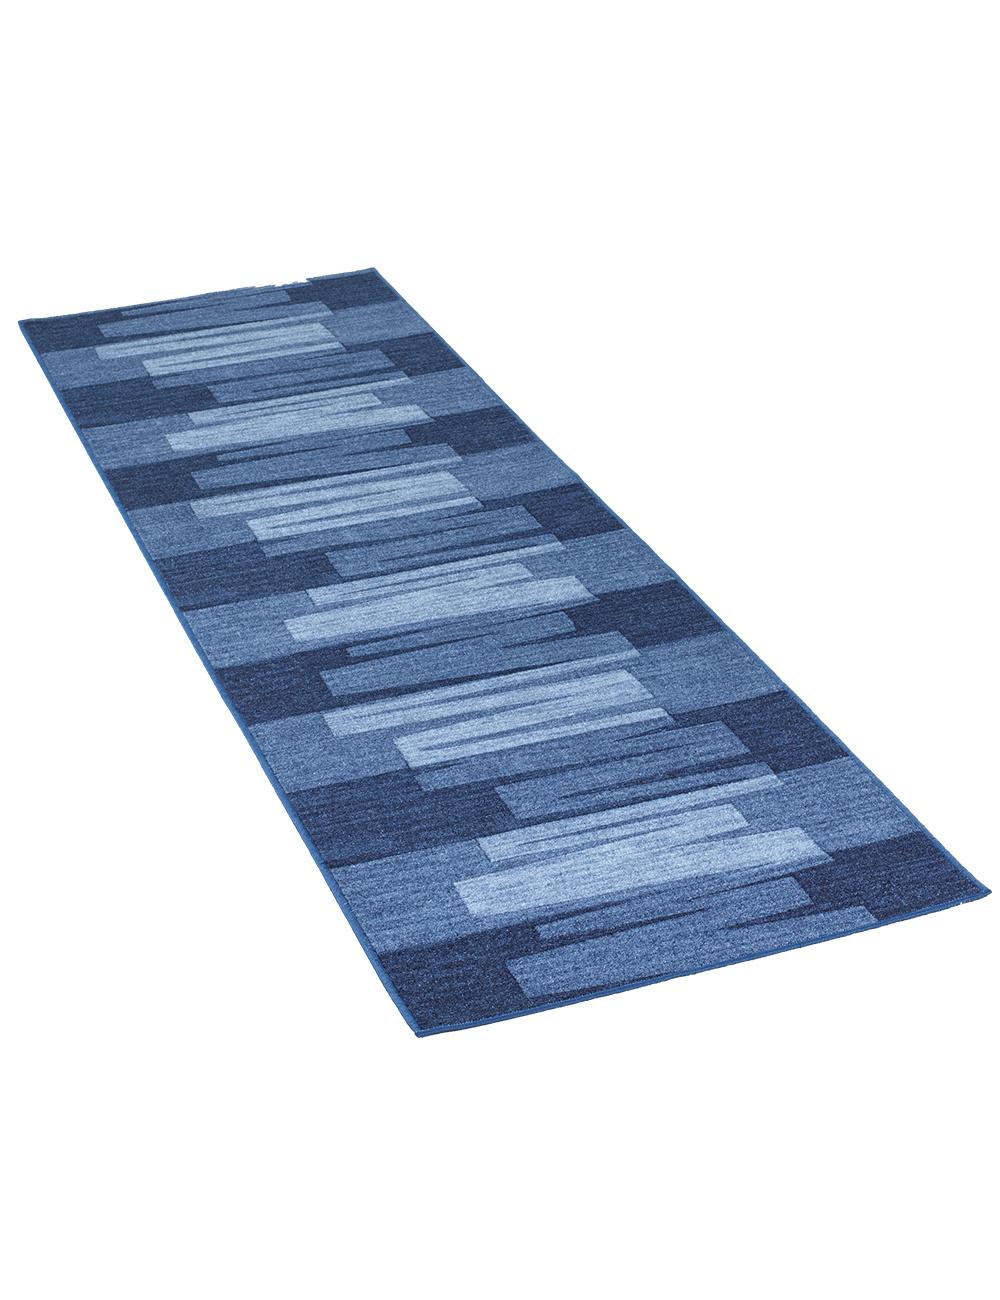 tapis de couloir nuovo bleu. Black Bedroom Furniture Sets. Home Design Ideas